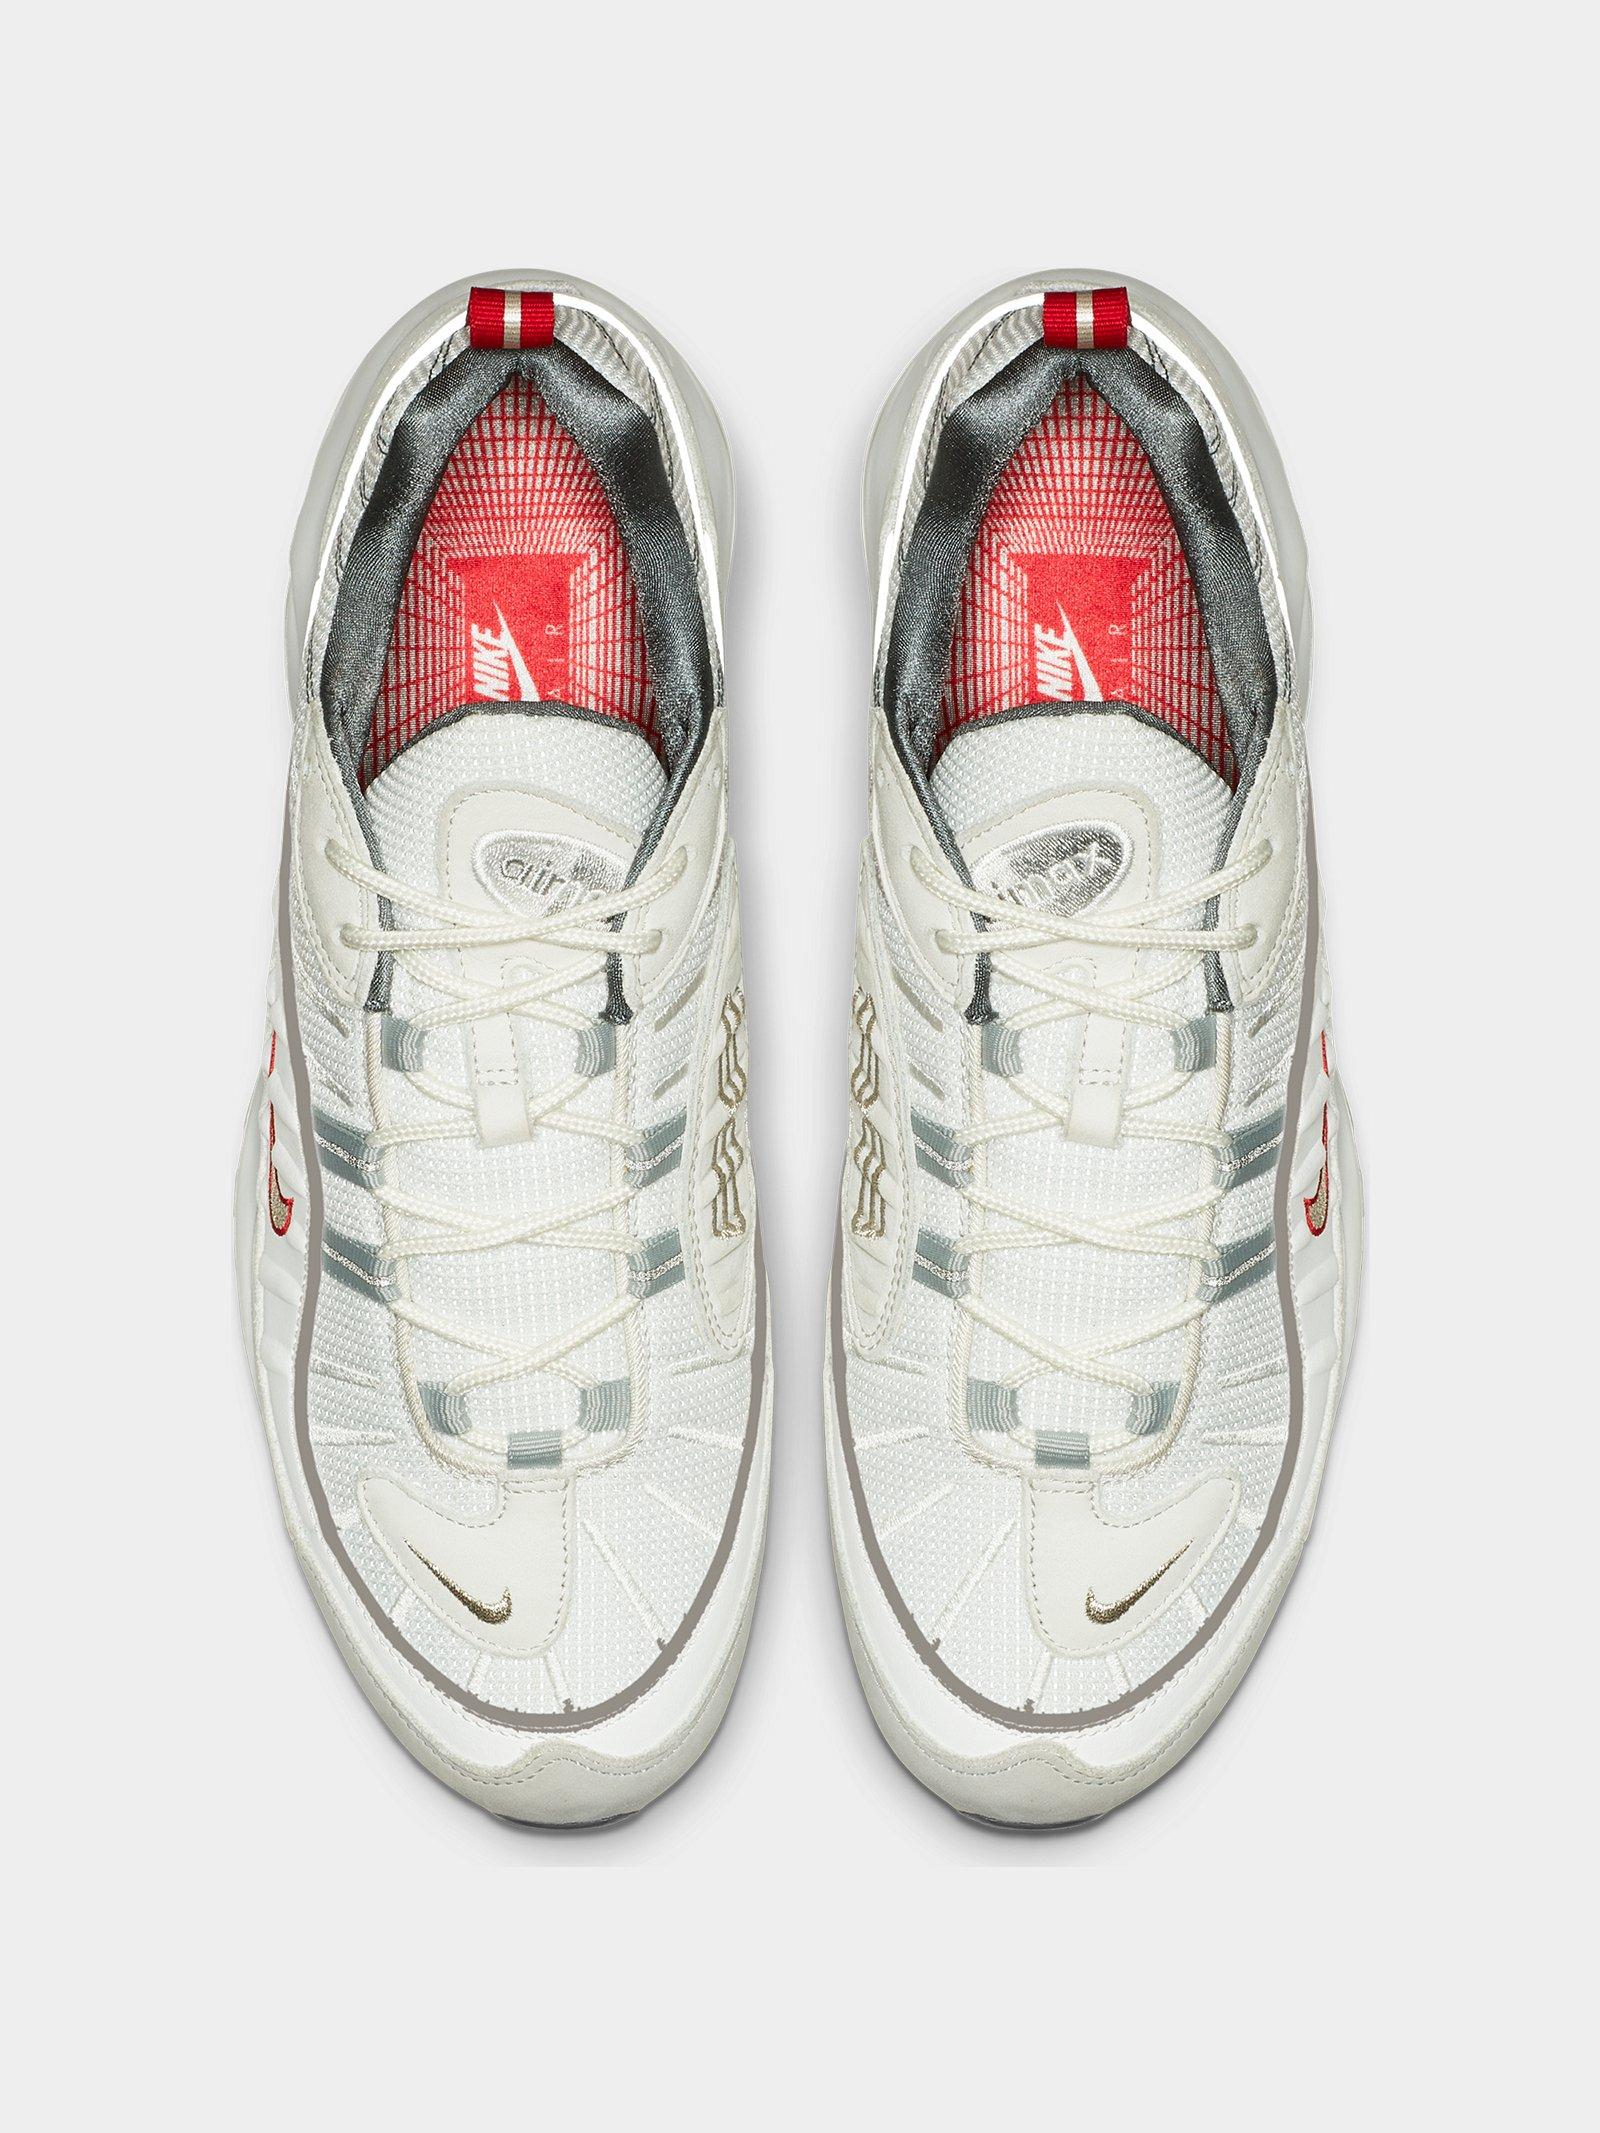 2e742de95d9a Lyst - Nike Air Max 98 Summit White in White for Men - Save 11%